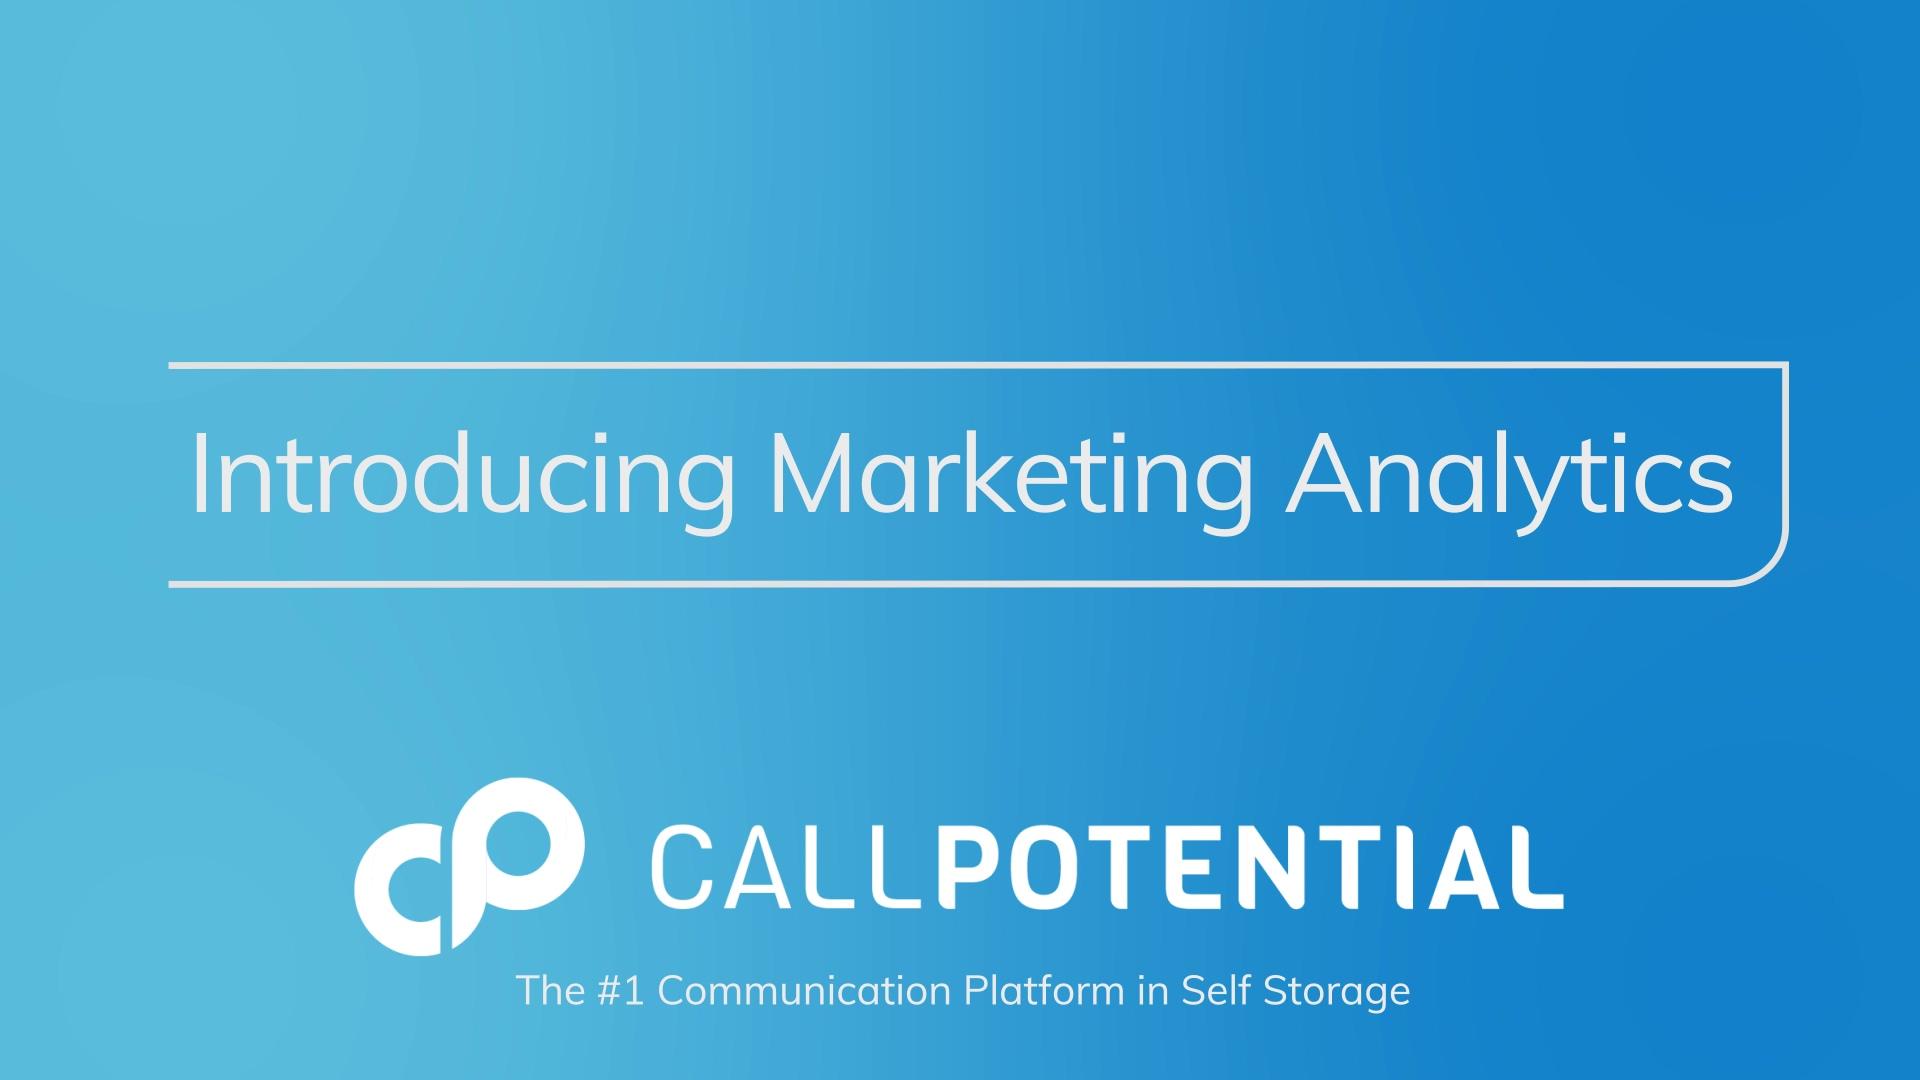 Introducing Marketing Analytics - Video